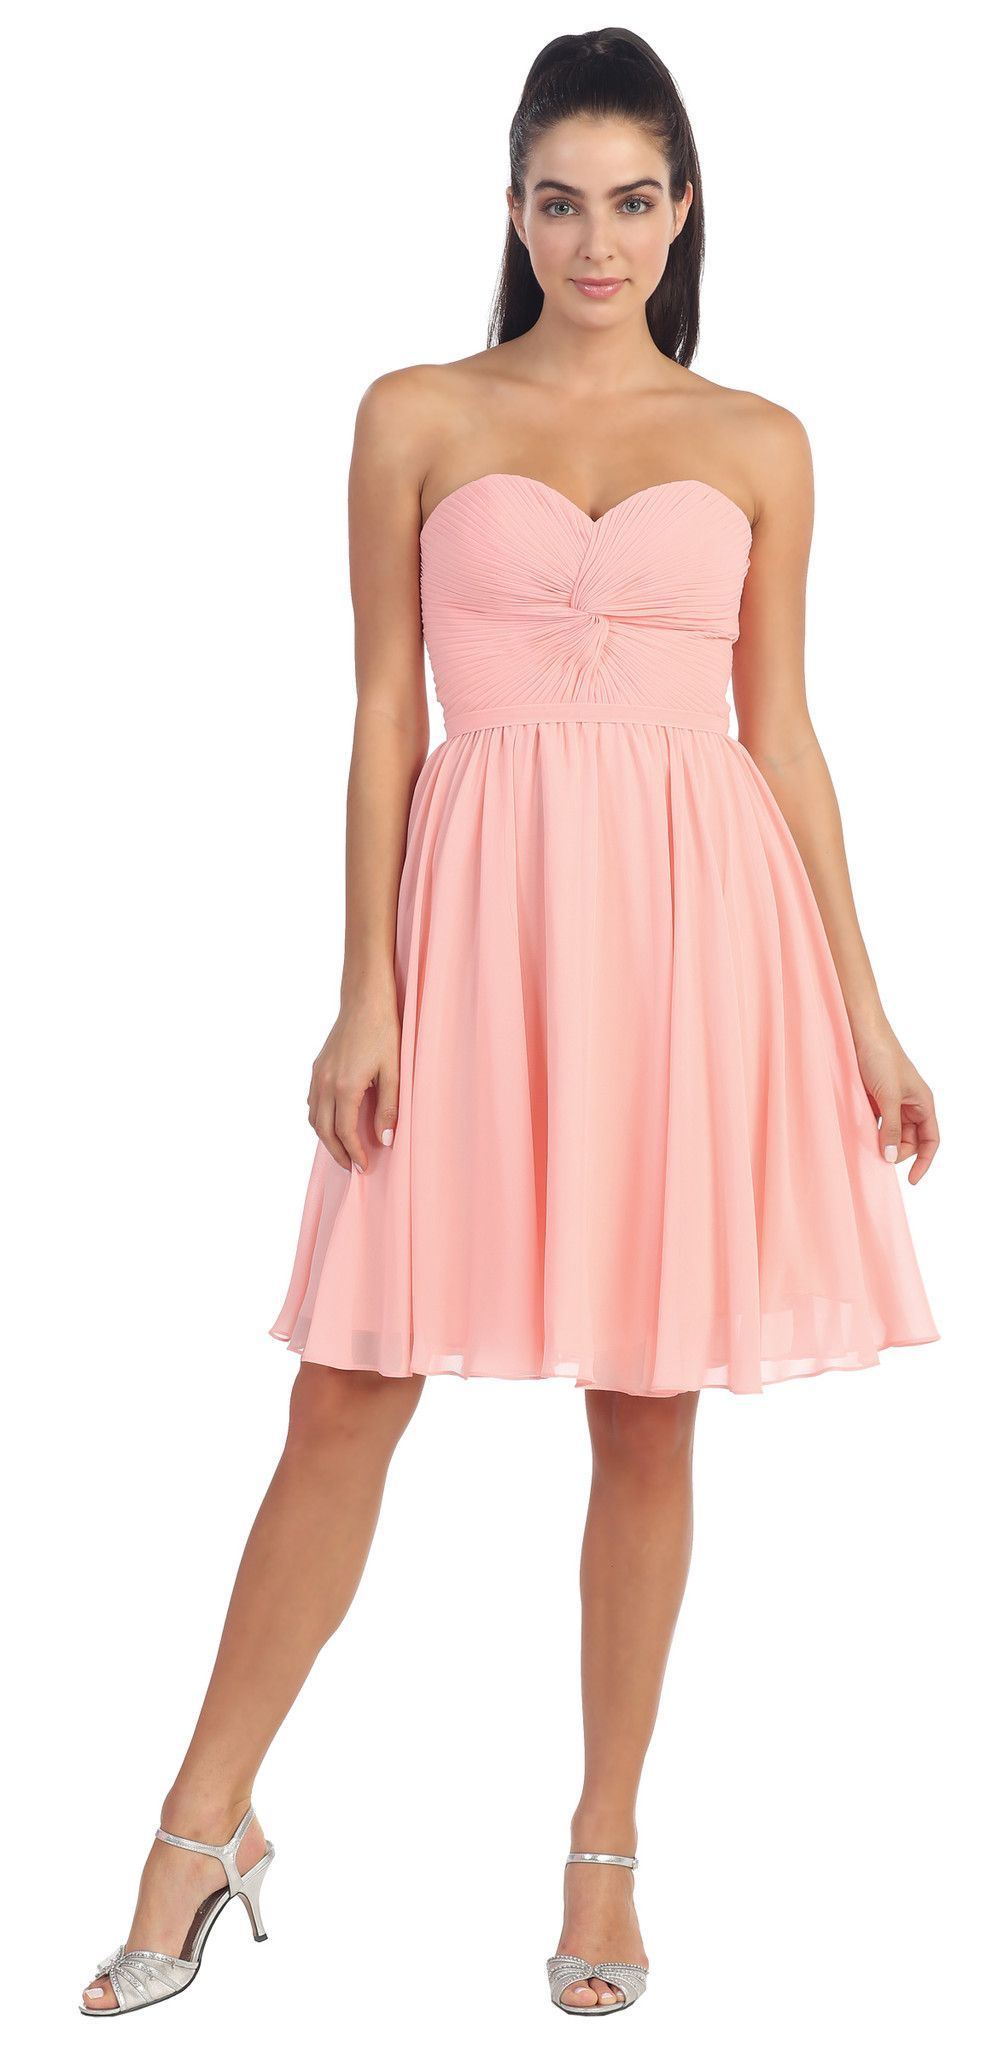 Elegant Simple Short Blush Strapless Bridesmaid Dress | Brides and ...